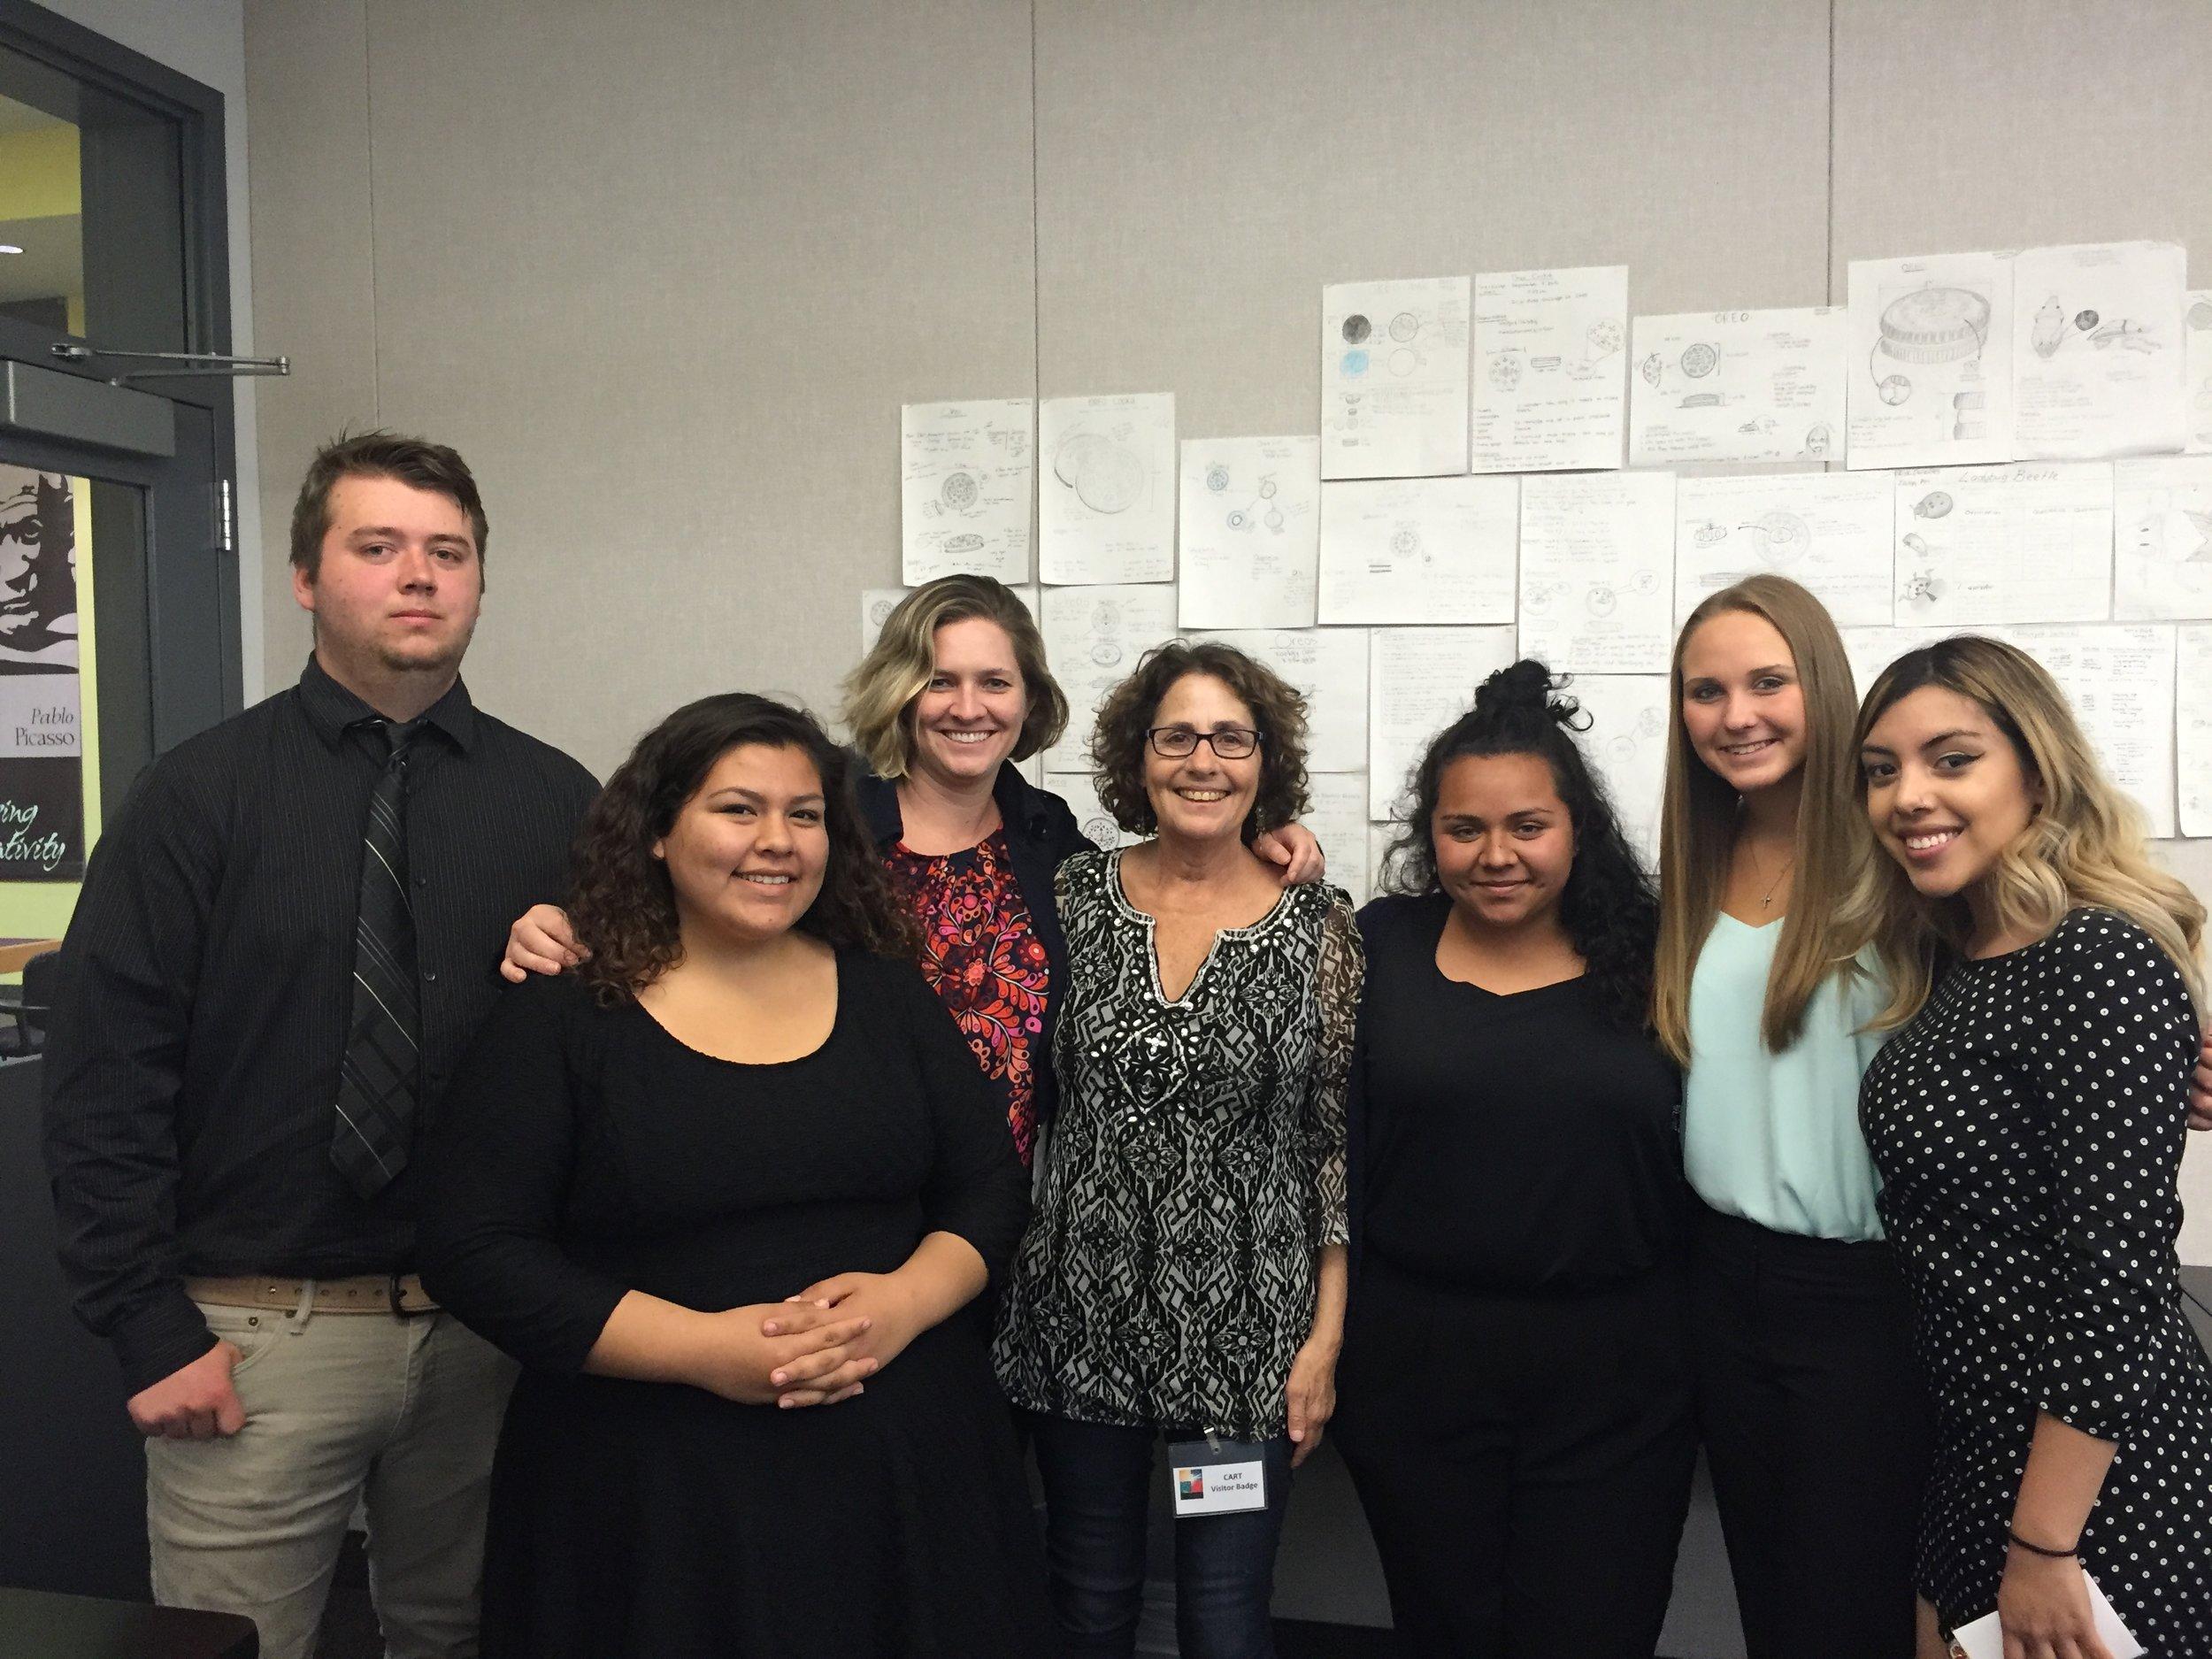 CART Spring Mentorship Project Air Pollution Team 2016